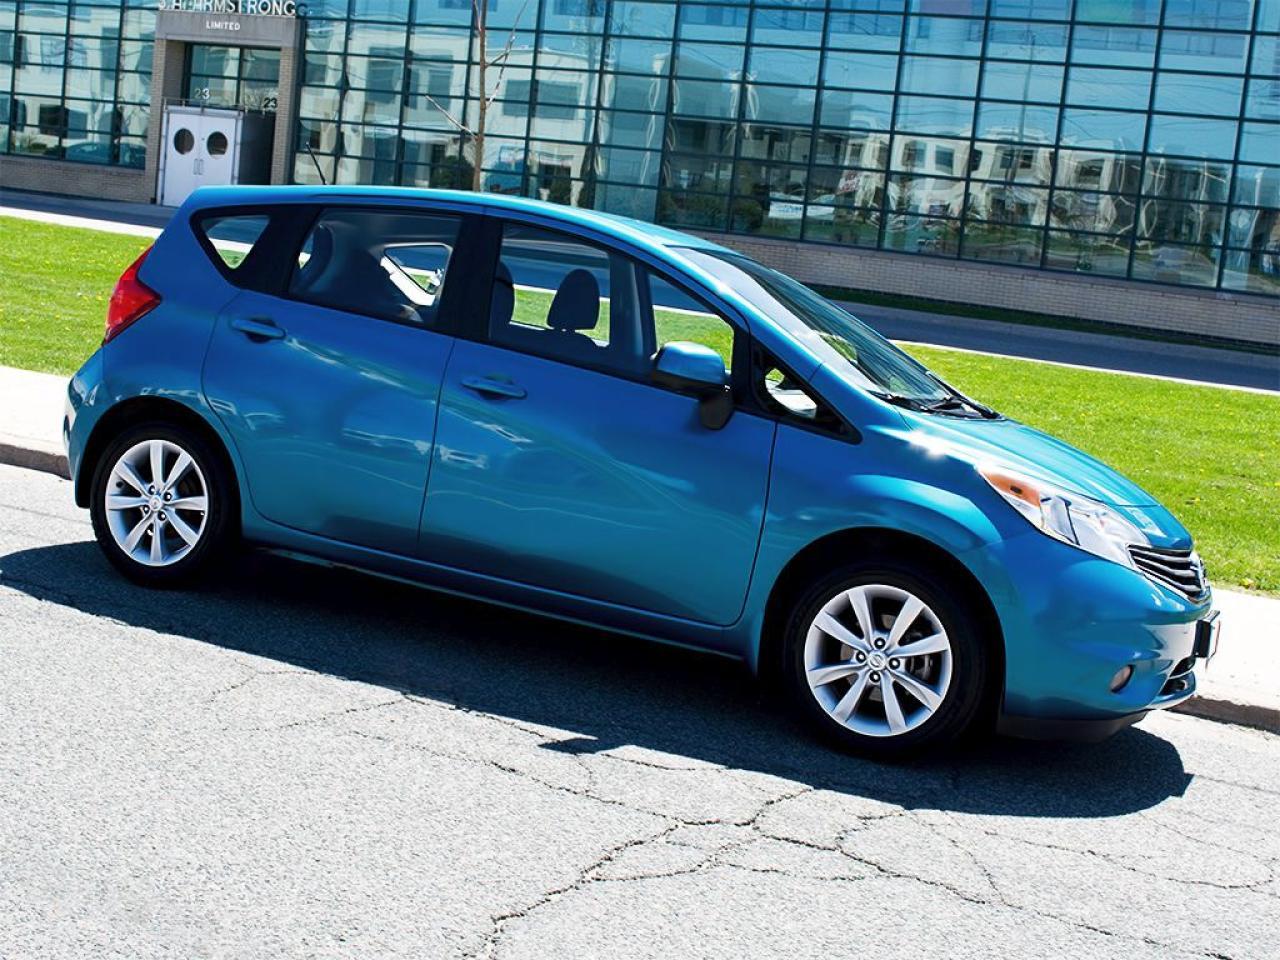 Photo of blue metallic 2014 Nissan Versa Note